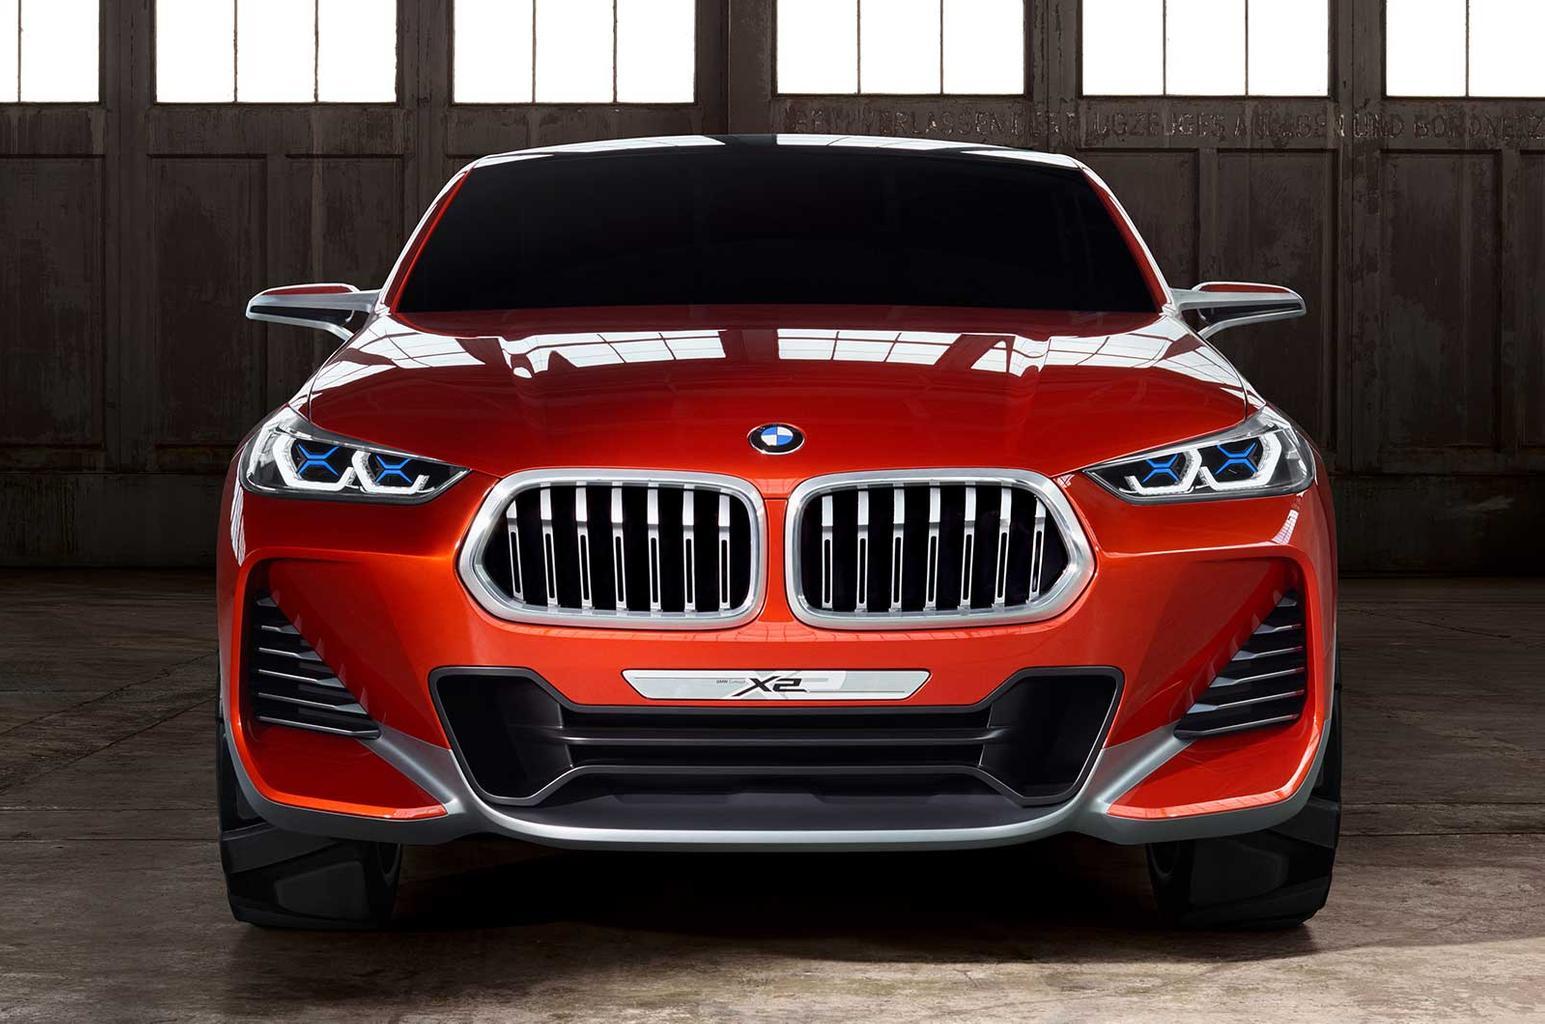 BMW X2 concept revealed